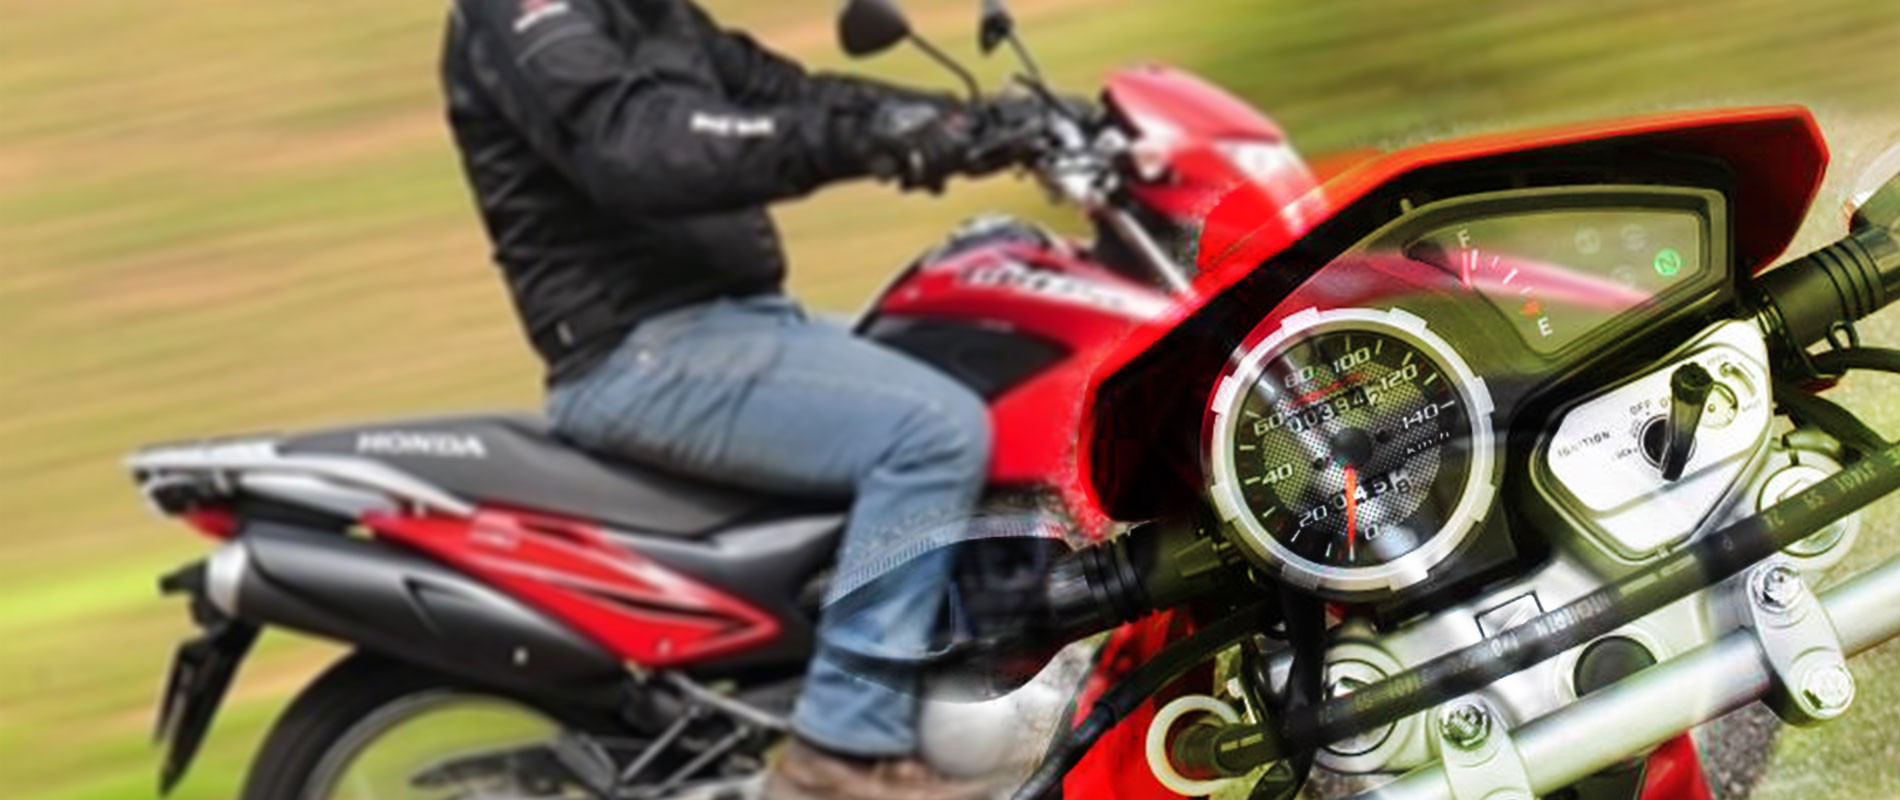 DICA-41-Honda-Bros-150-